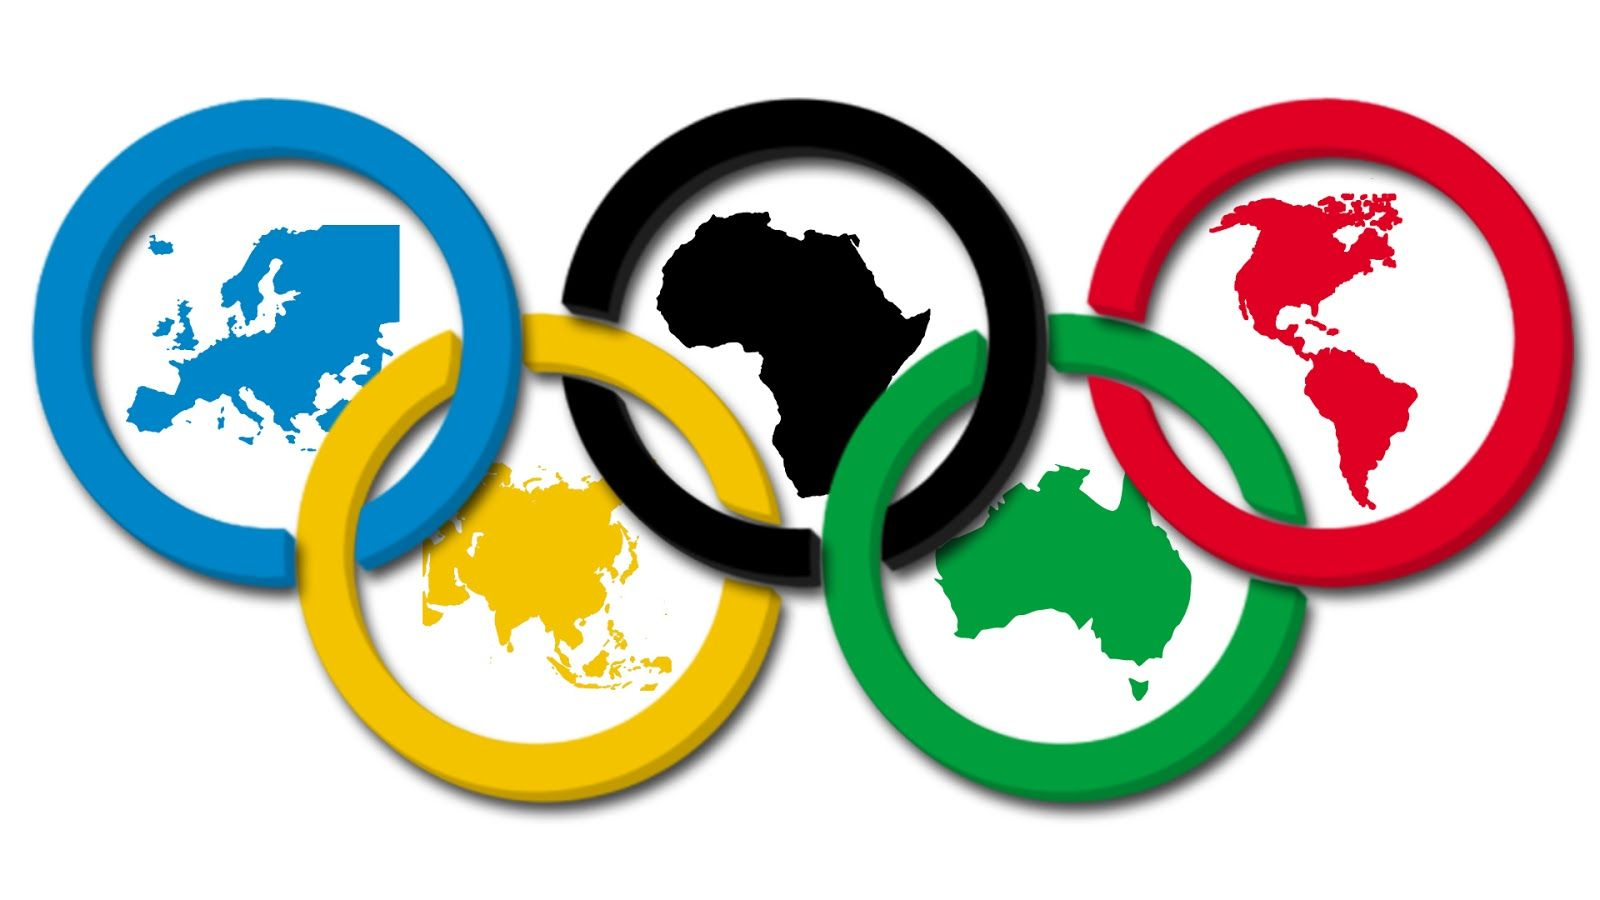 anéis olímpicos cores continentes - Pesquisa Google   Atletas ...